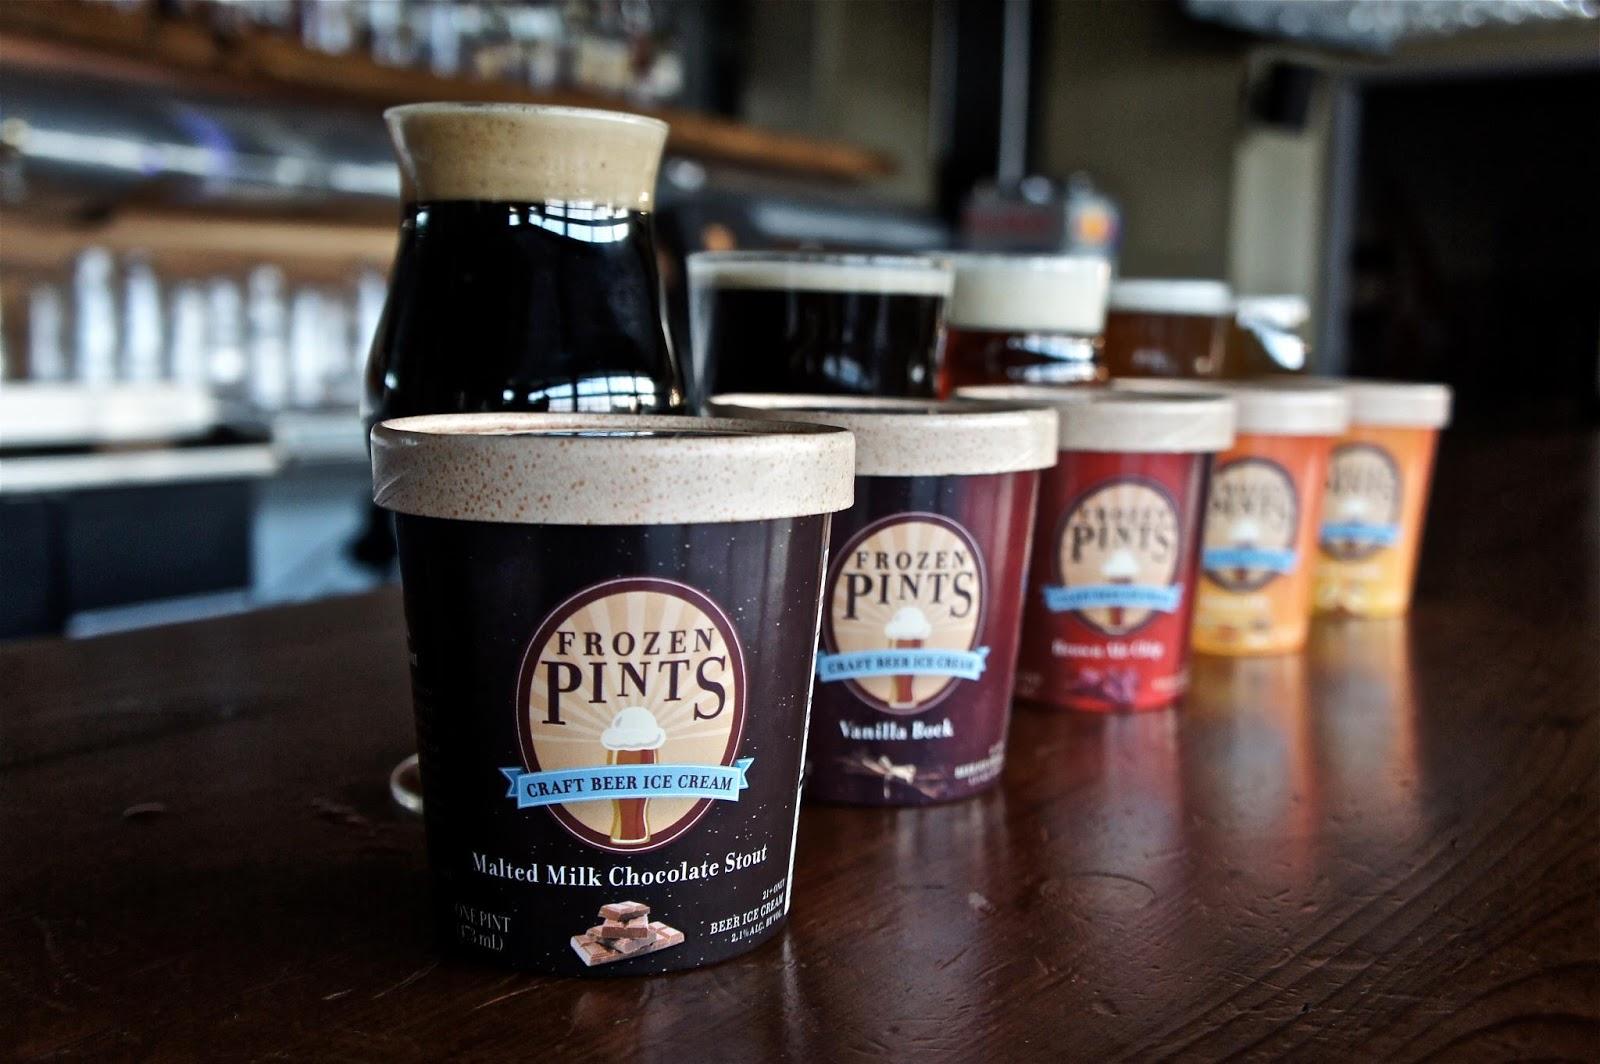 The Ice Cream Informant: Frozen Pints Craft Beer Ice Cream